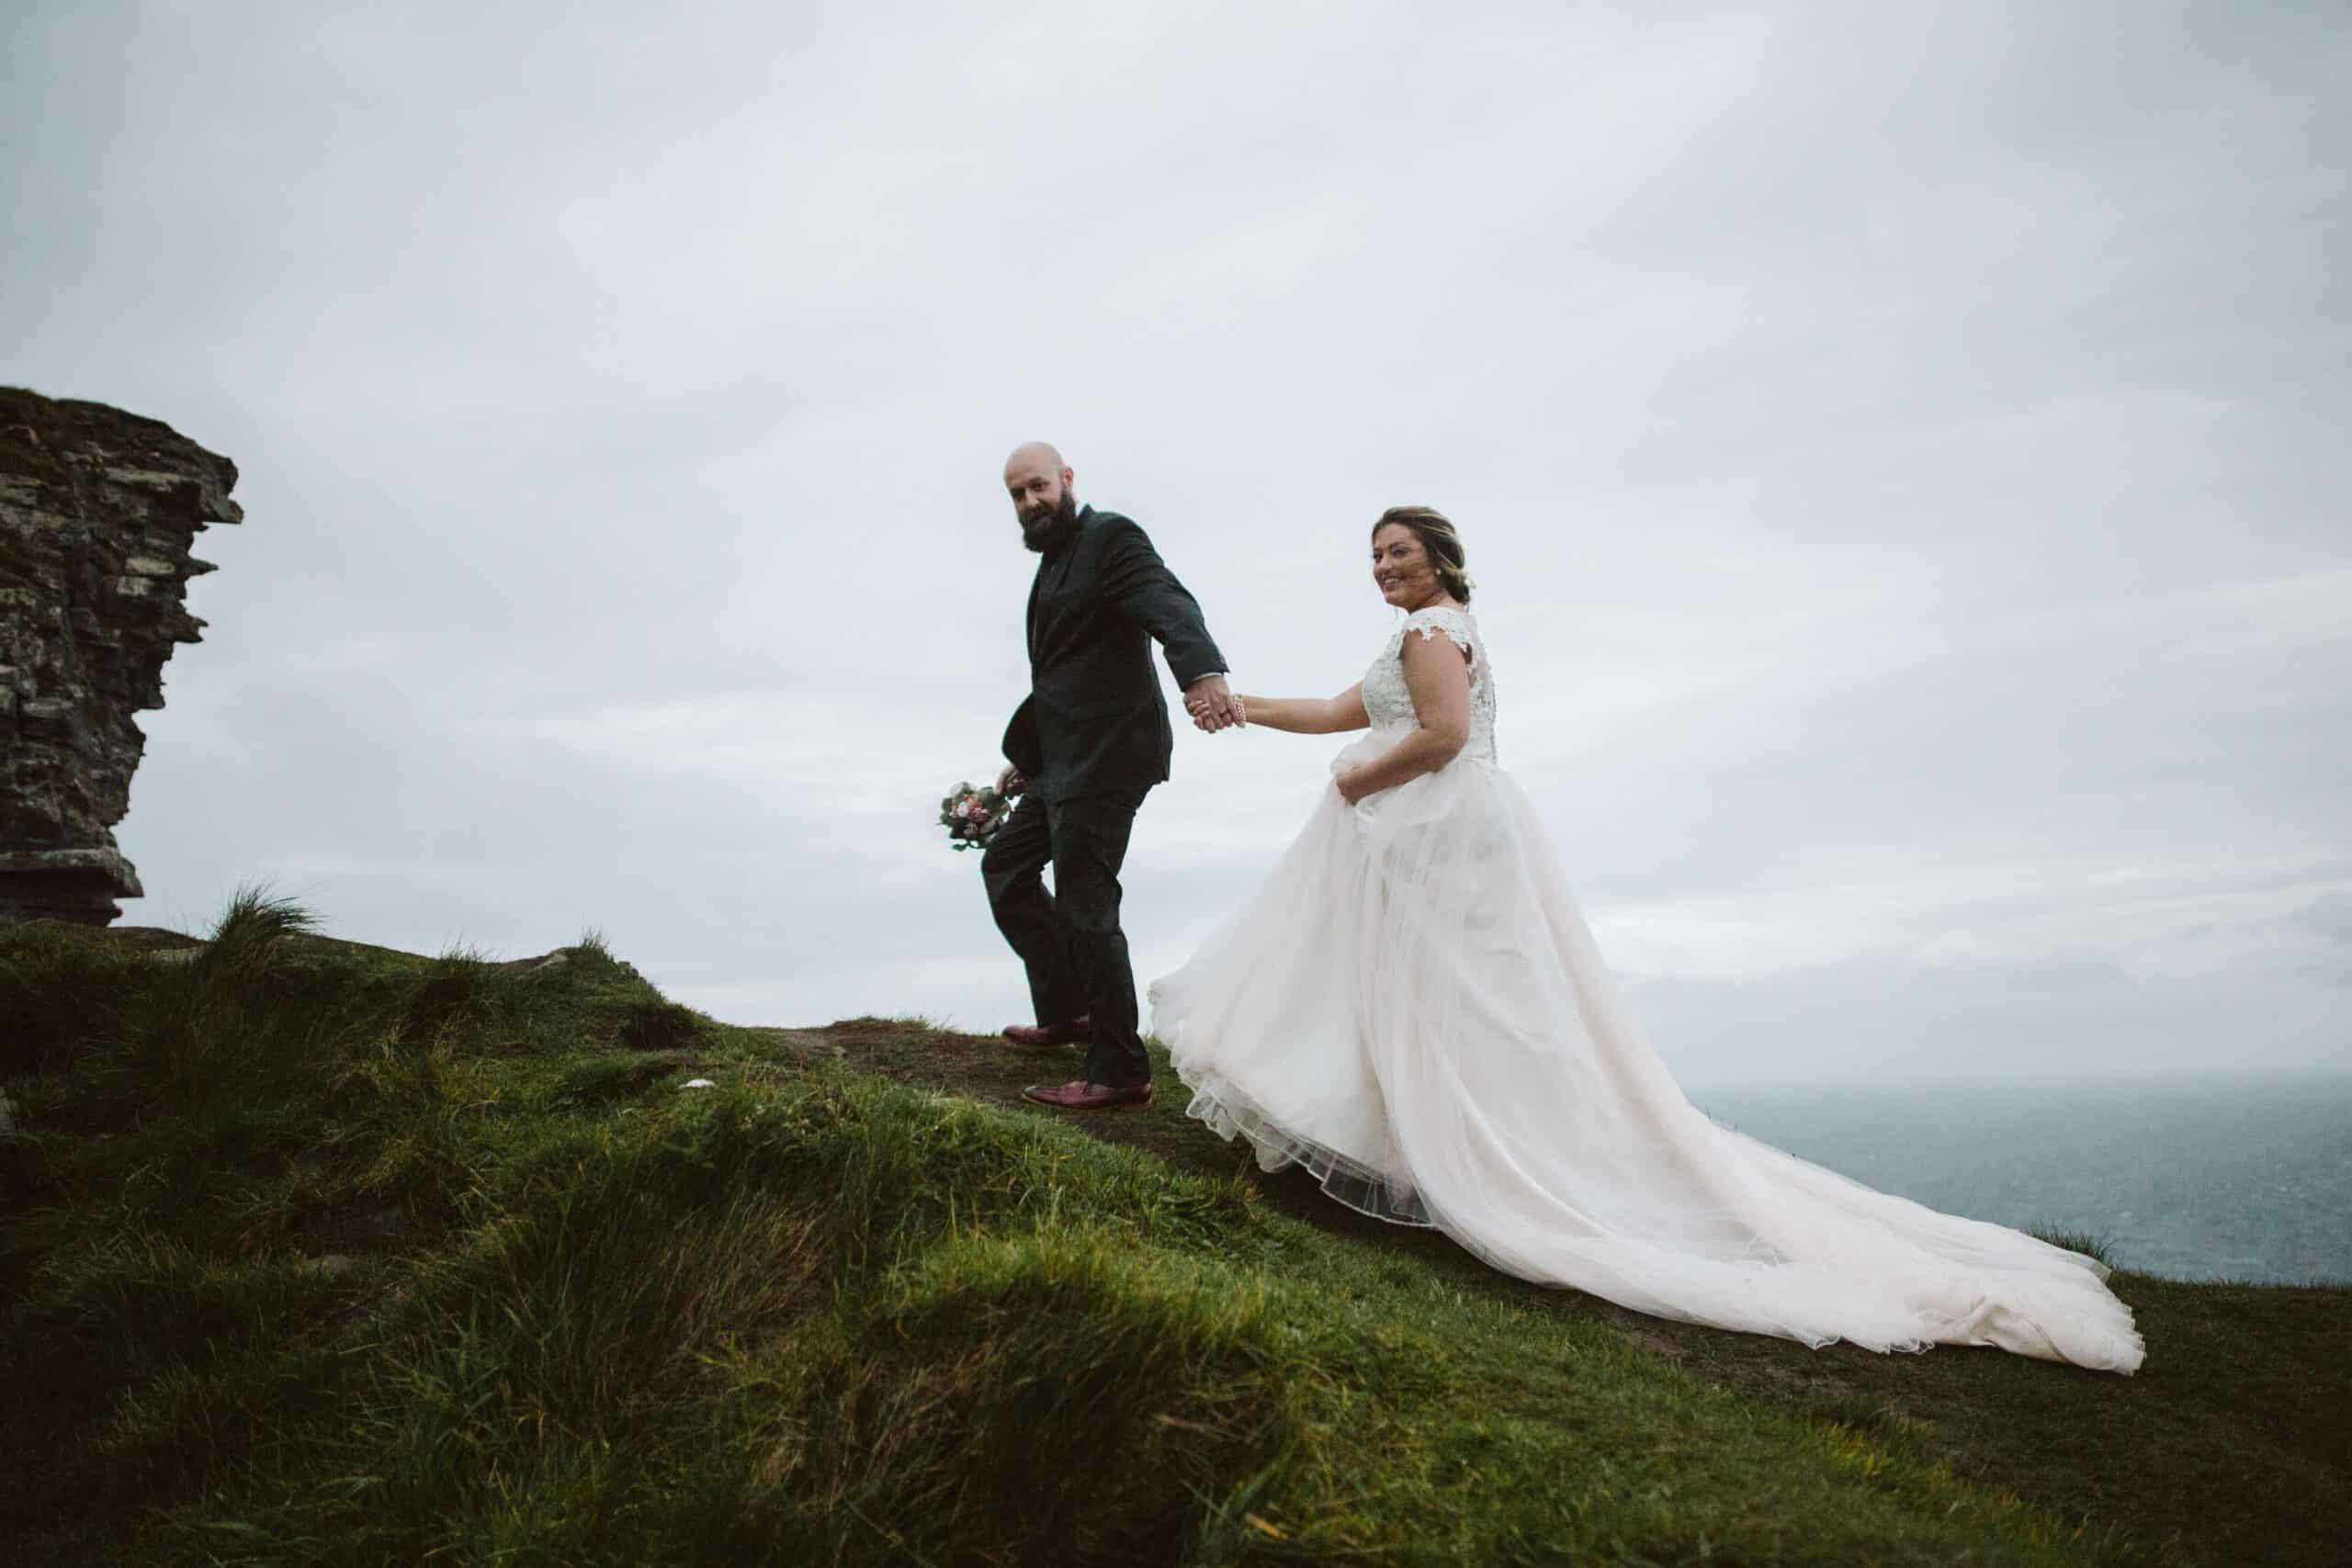 Cliffs of Moher Wedding Hags head, couple climb a hill